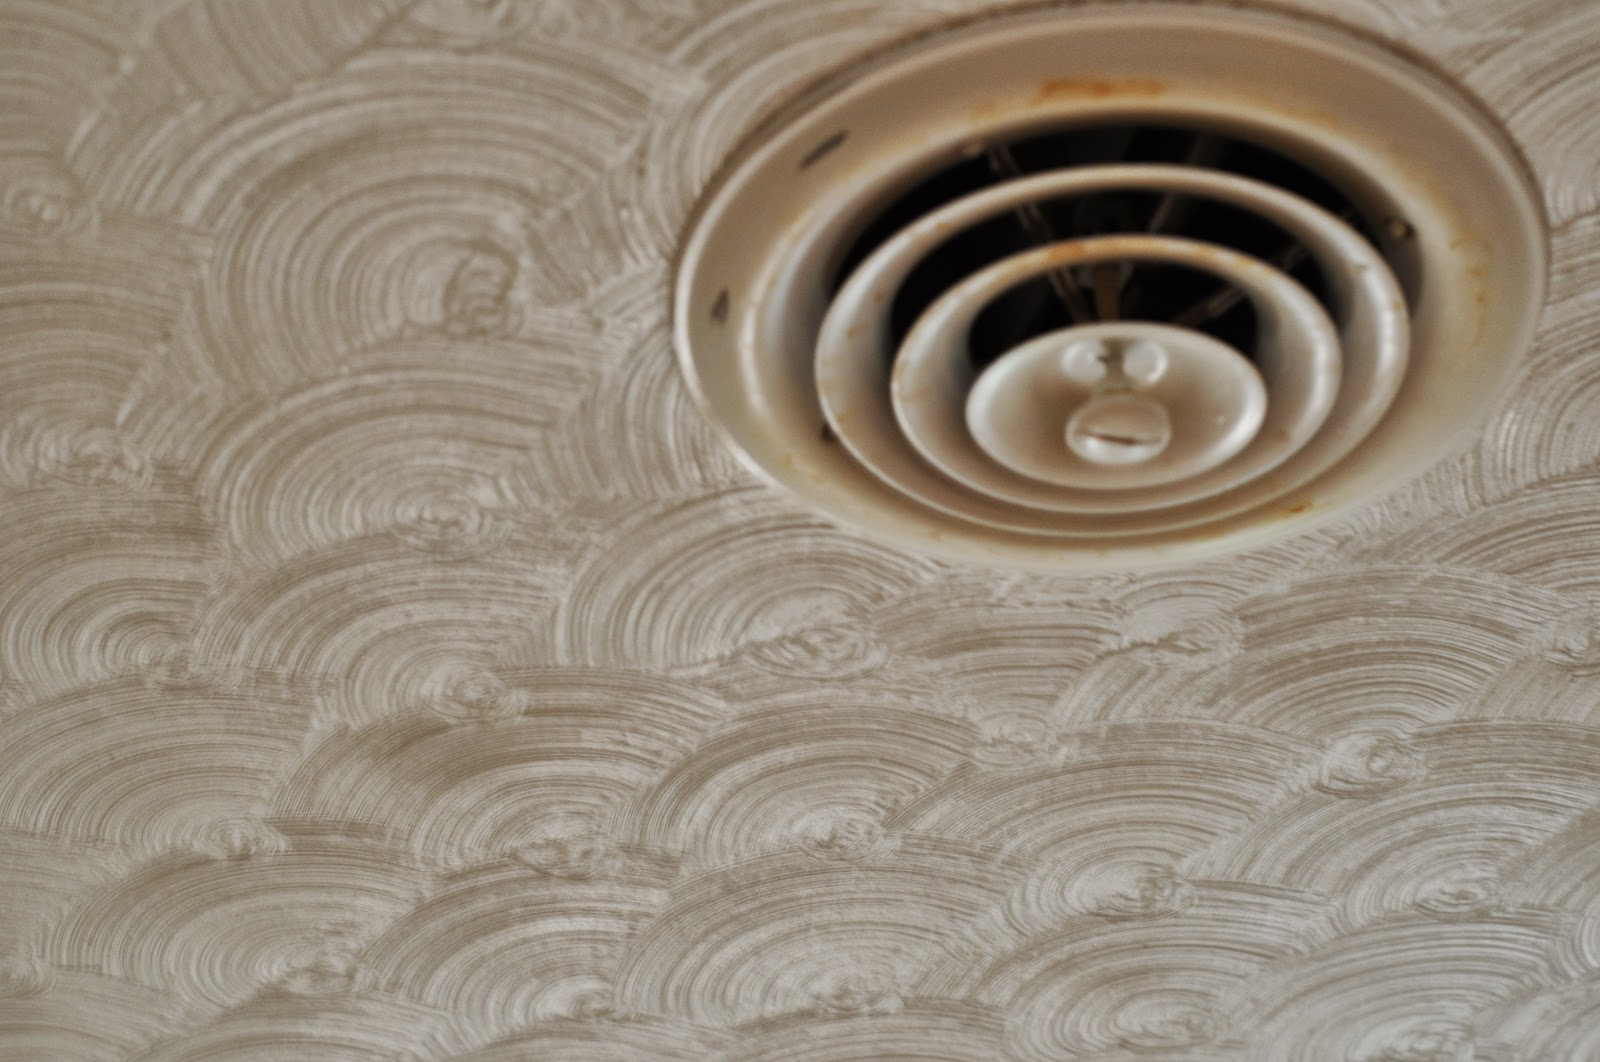 Swirl Ceiling Texture | www.pixshark.com - Images ...